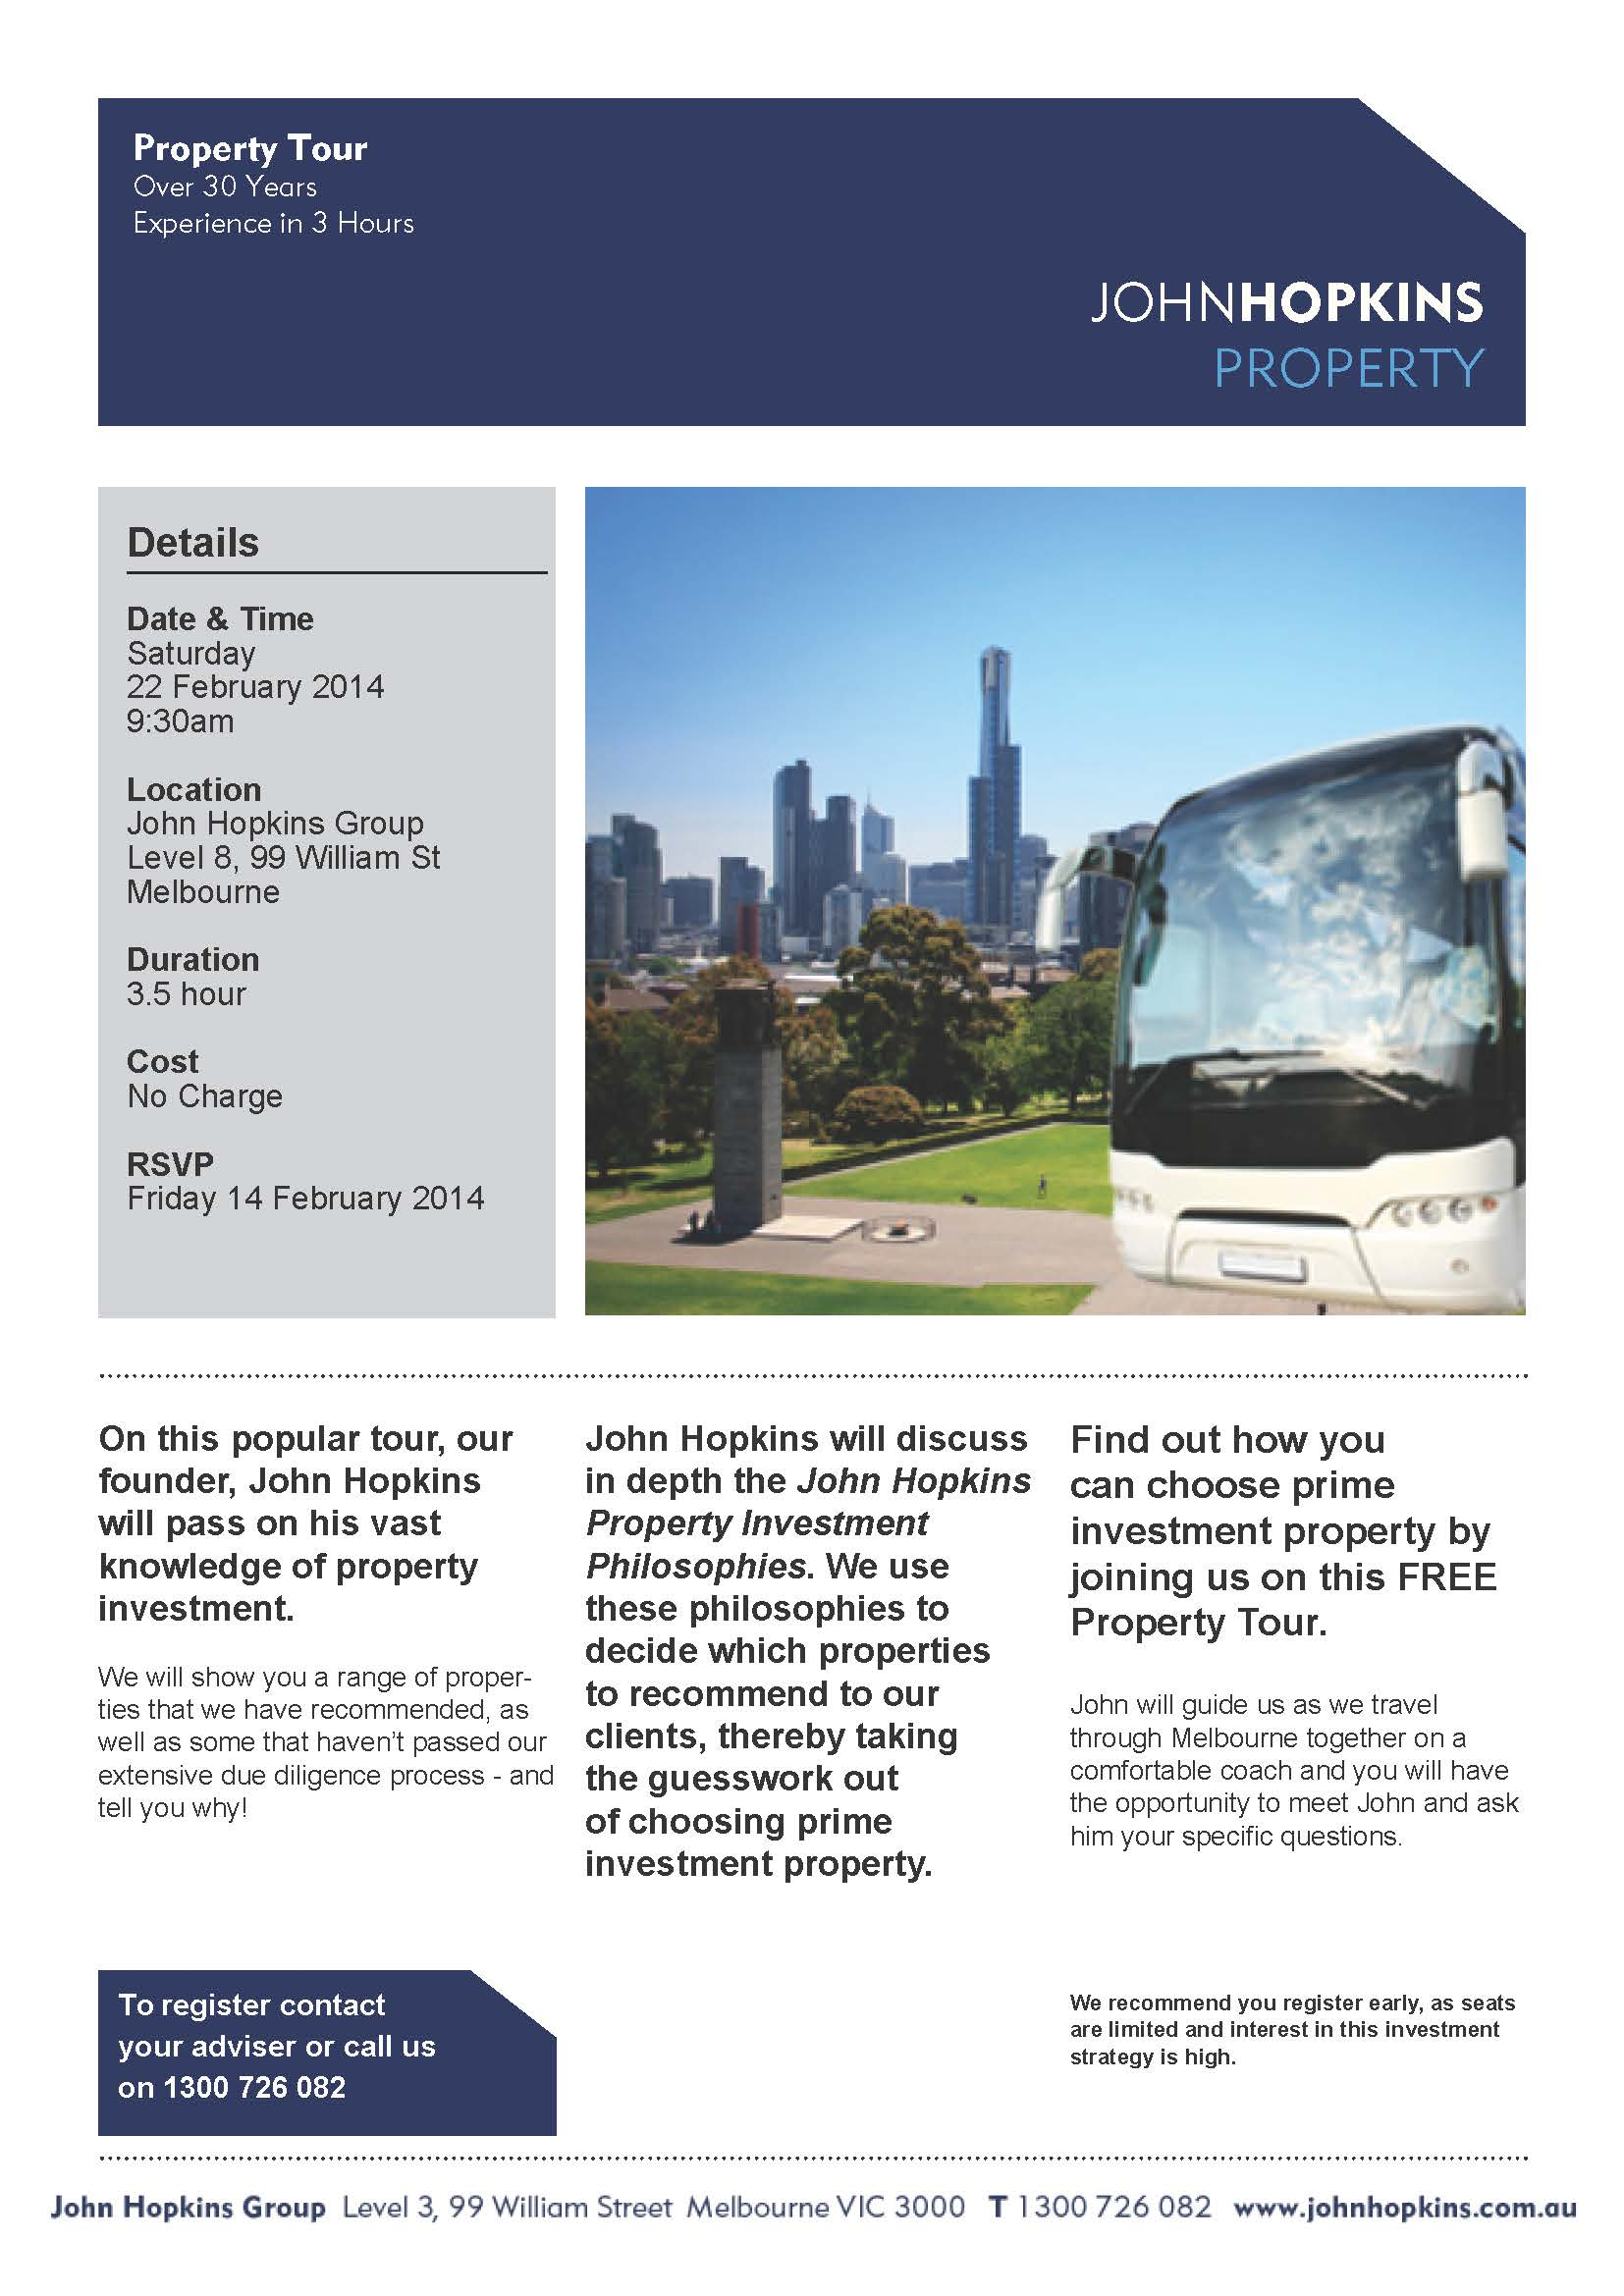 Property Tour Invitation - 22FEB2014